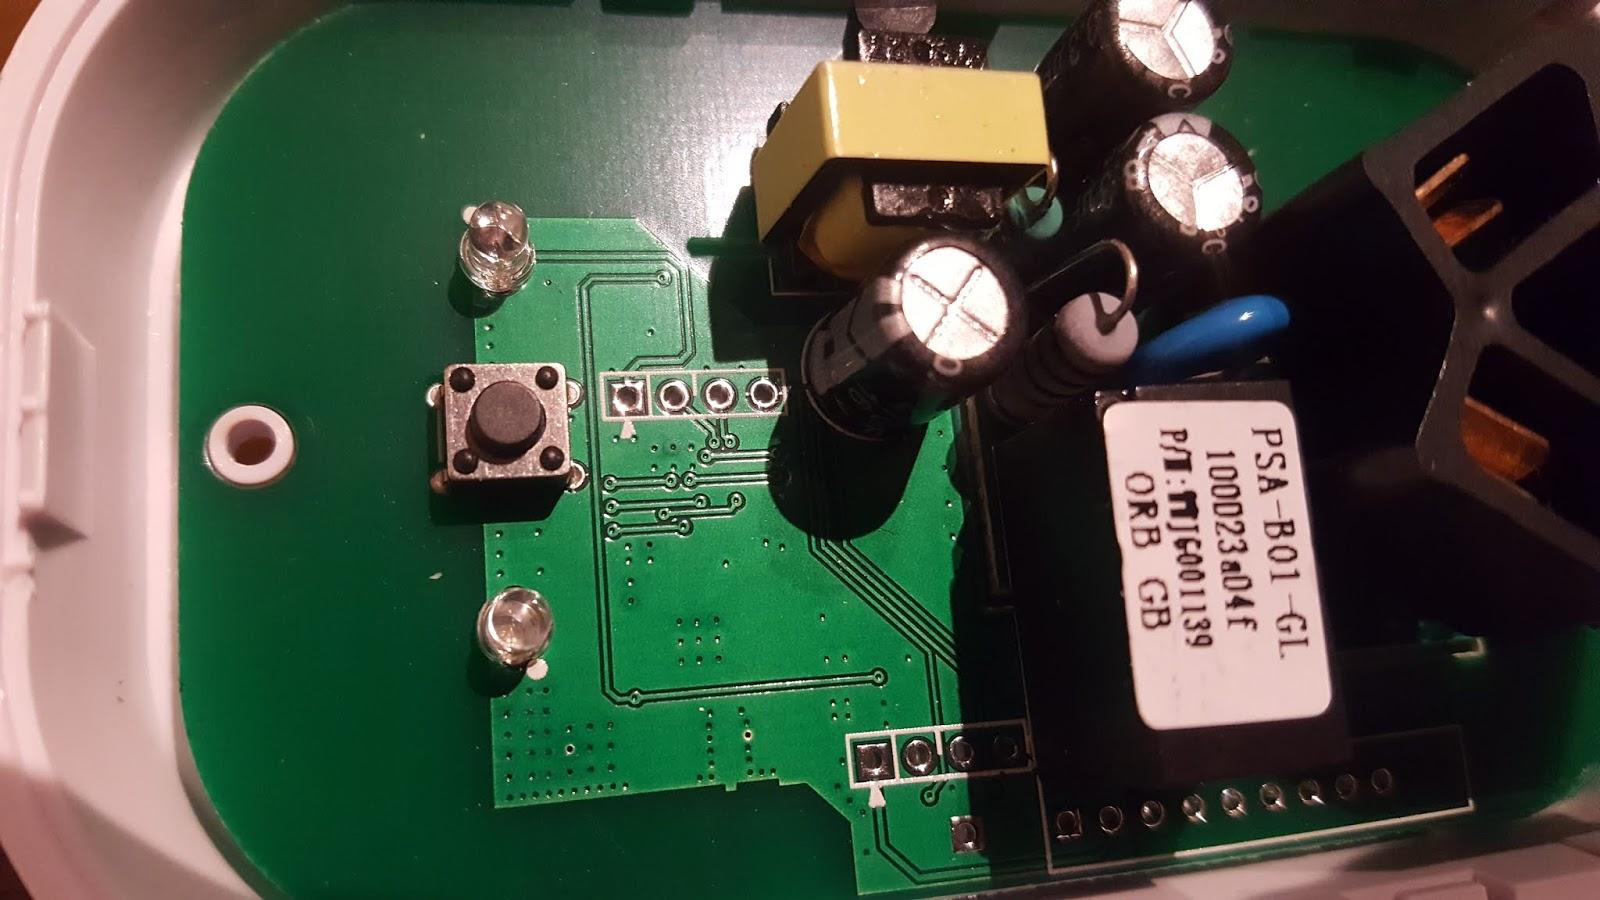 Kelvin Nicholson's Abode: IoT Foray with Sonoff S20 / IFTTT / Lambda